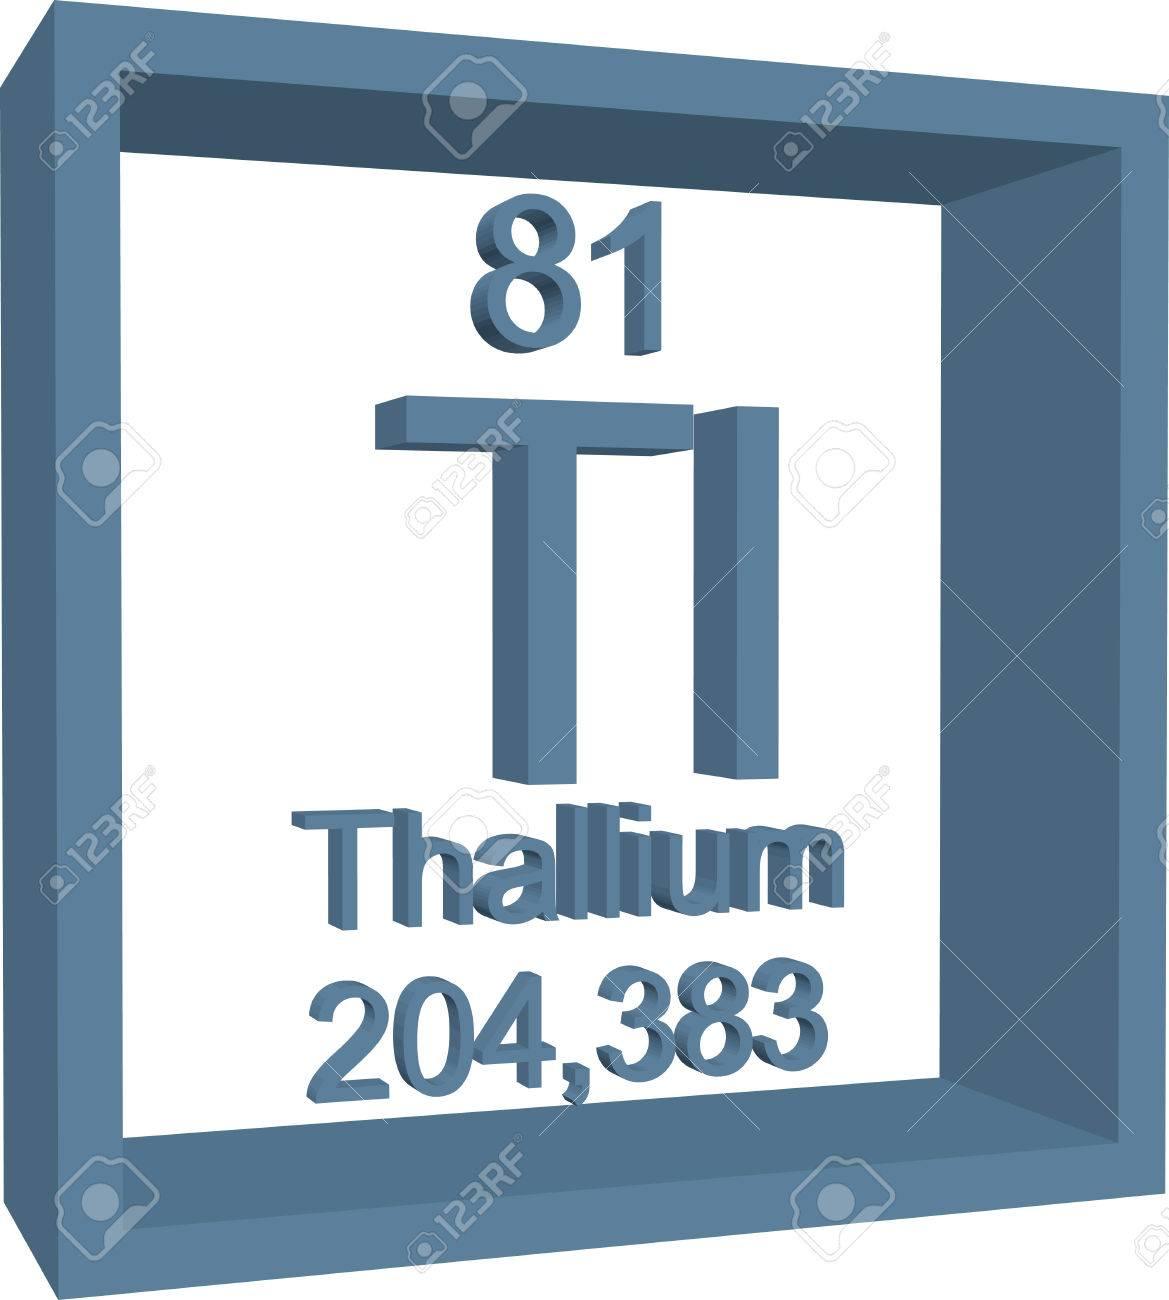 Periodic table of elements thallium royalty free cliparts vectors periodic table of elements thallium stock vector 57970478 urtaz Choice Image